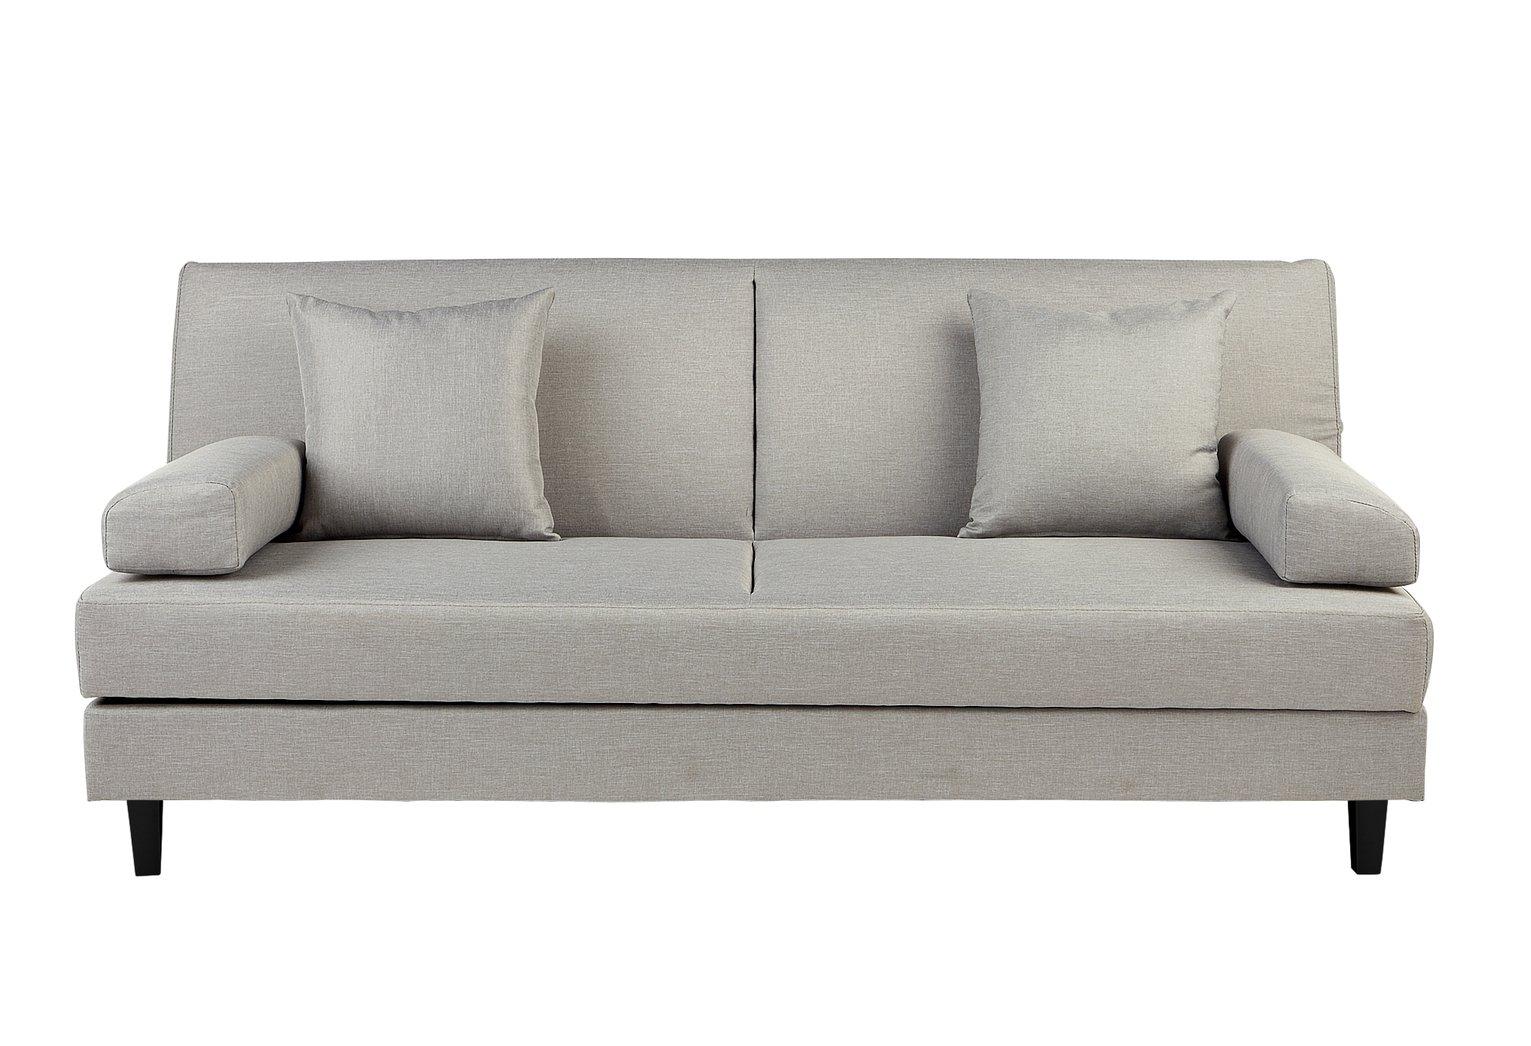 Buy Argos Home Chase Fabric Clic Clac Sofa Bed - Light Grey | Sofa